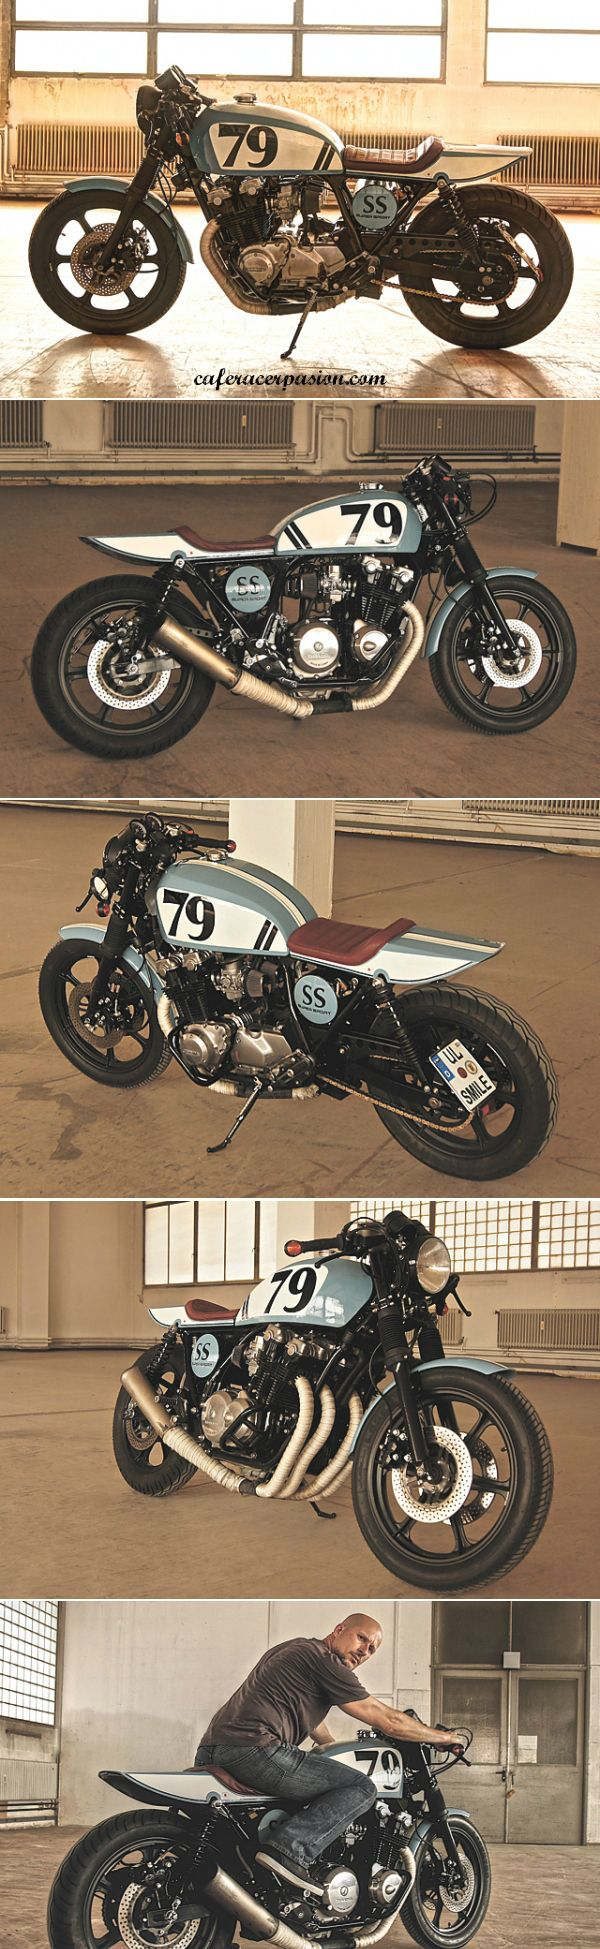 Honda cb900f bol dor cafe racer by Andrea Goldemann #motorcycles #caferacer #motos   caferacerpasion.com